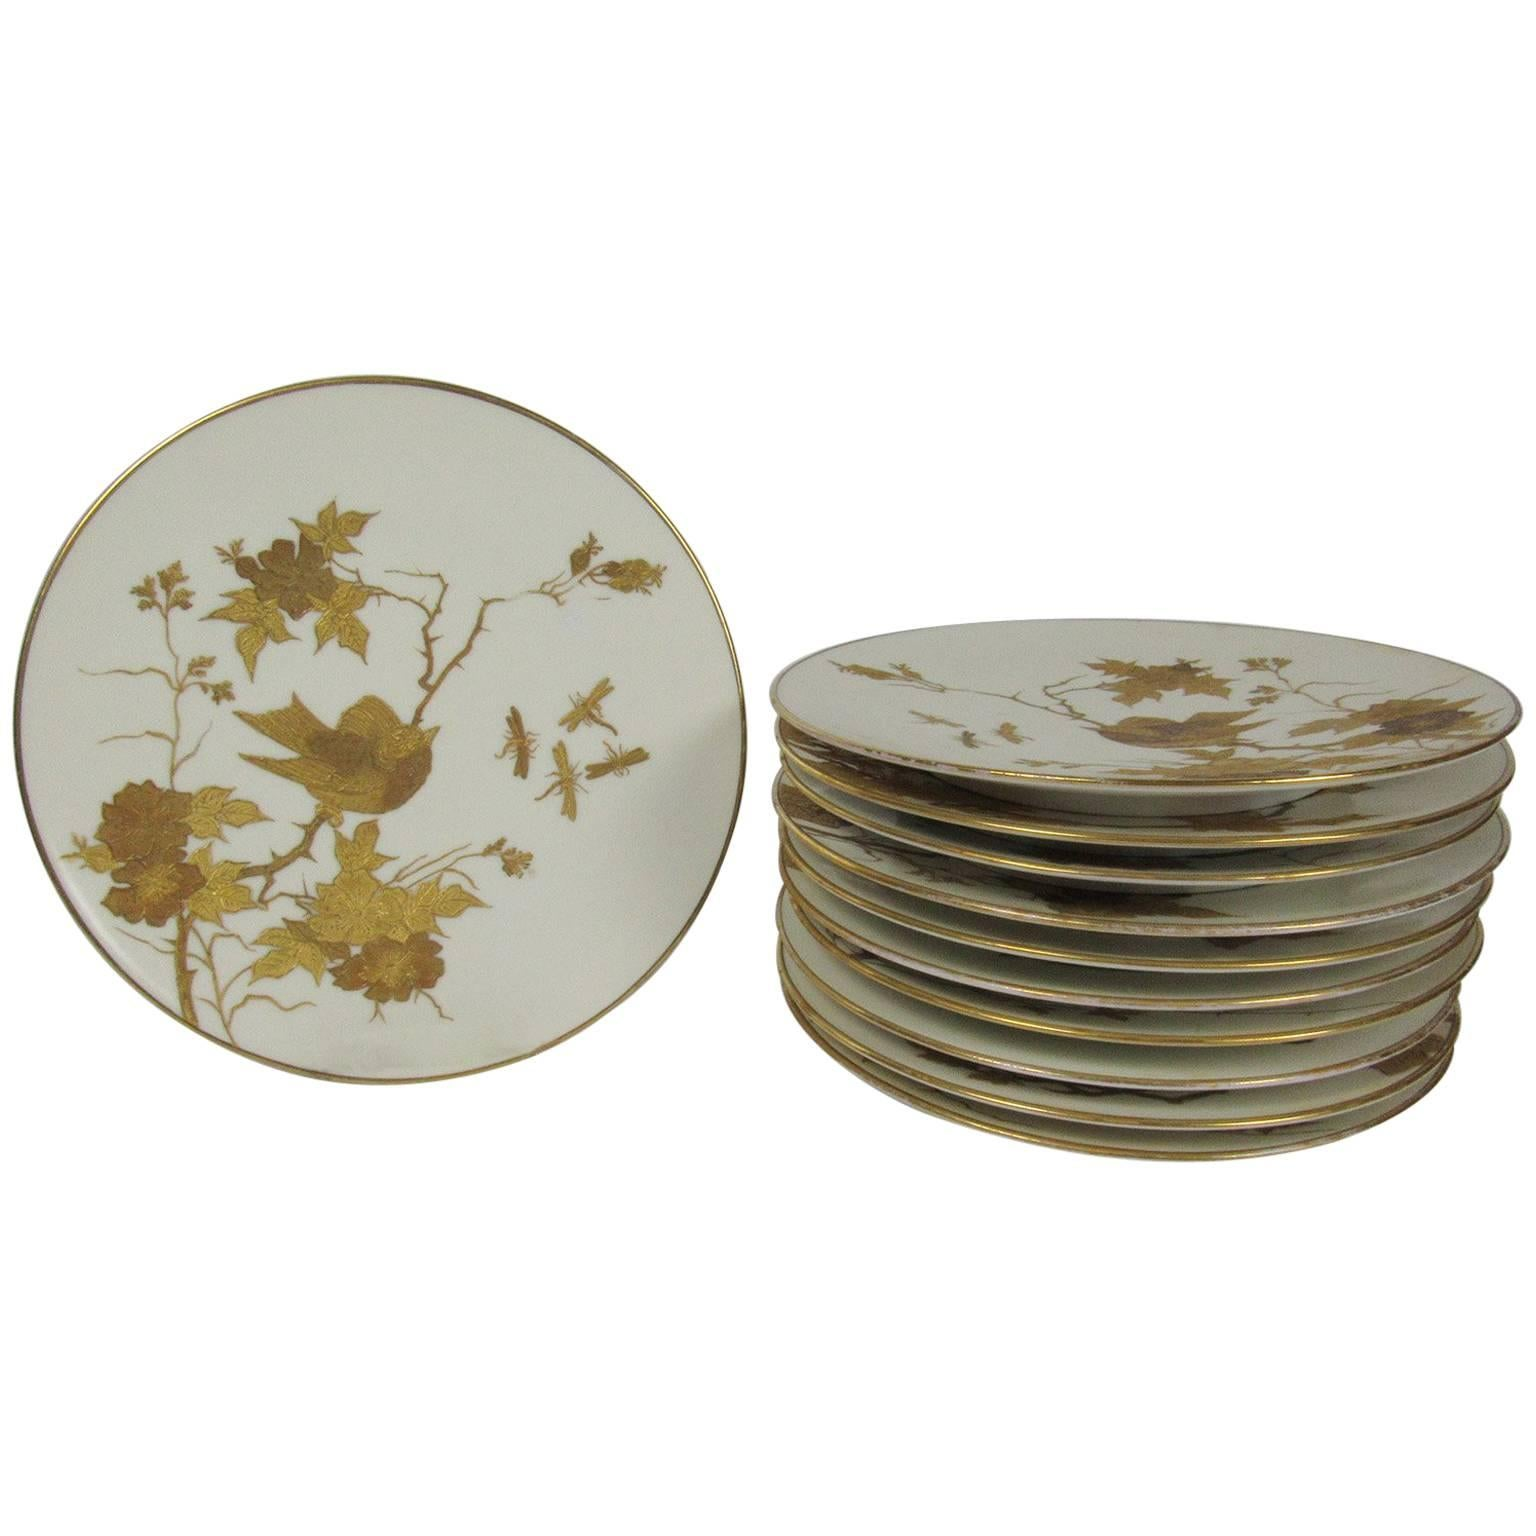 Set of 11 Fischer \u0026&; Meig Pirkenhammer German Plates  sc 1 st  1stDibs & German Dinner Plates - 68 For Sale at 1stdibs